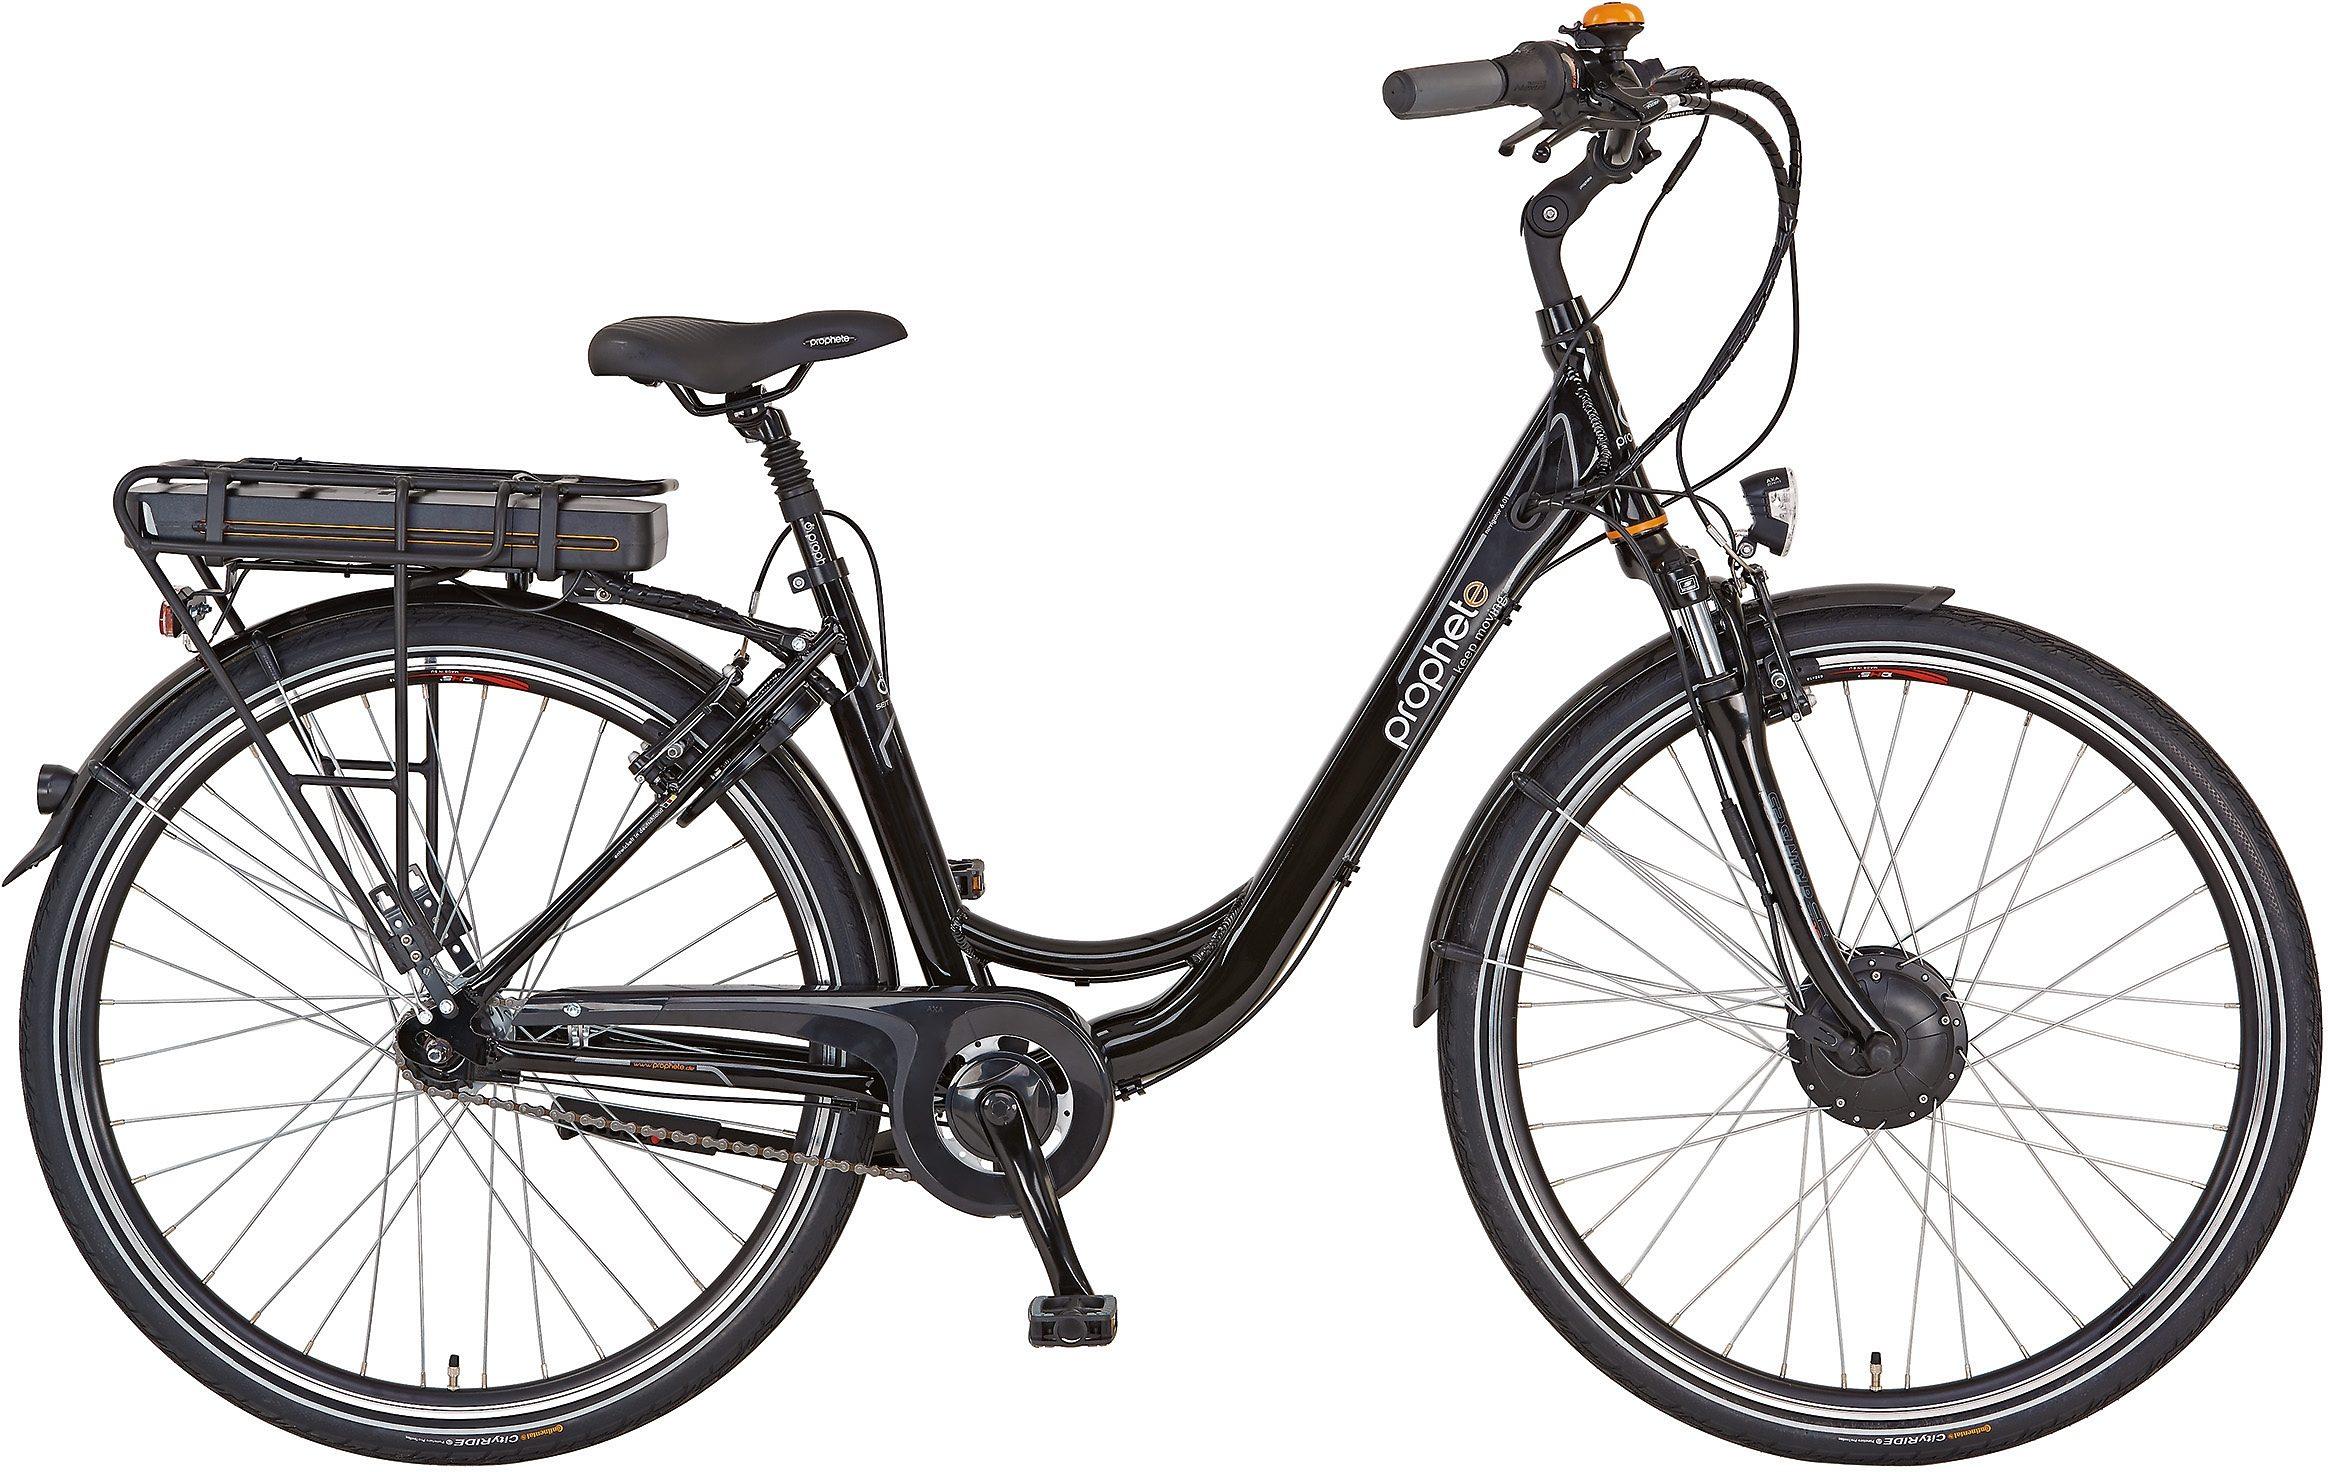 Prophete Damen Alu-City E-Bike, inkl. Smartphone, 28 Zoll, 7 Gg Shimano Nexus, »Navigator 6.01«